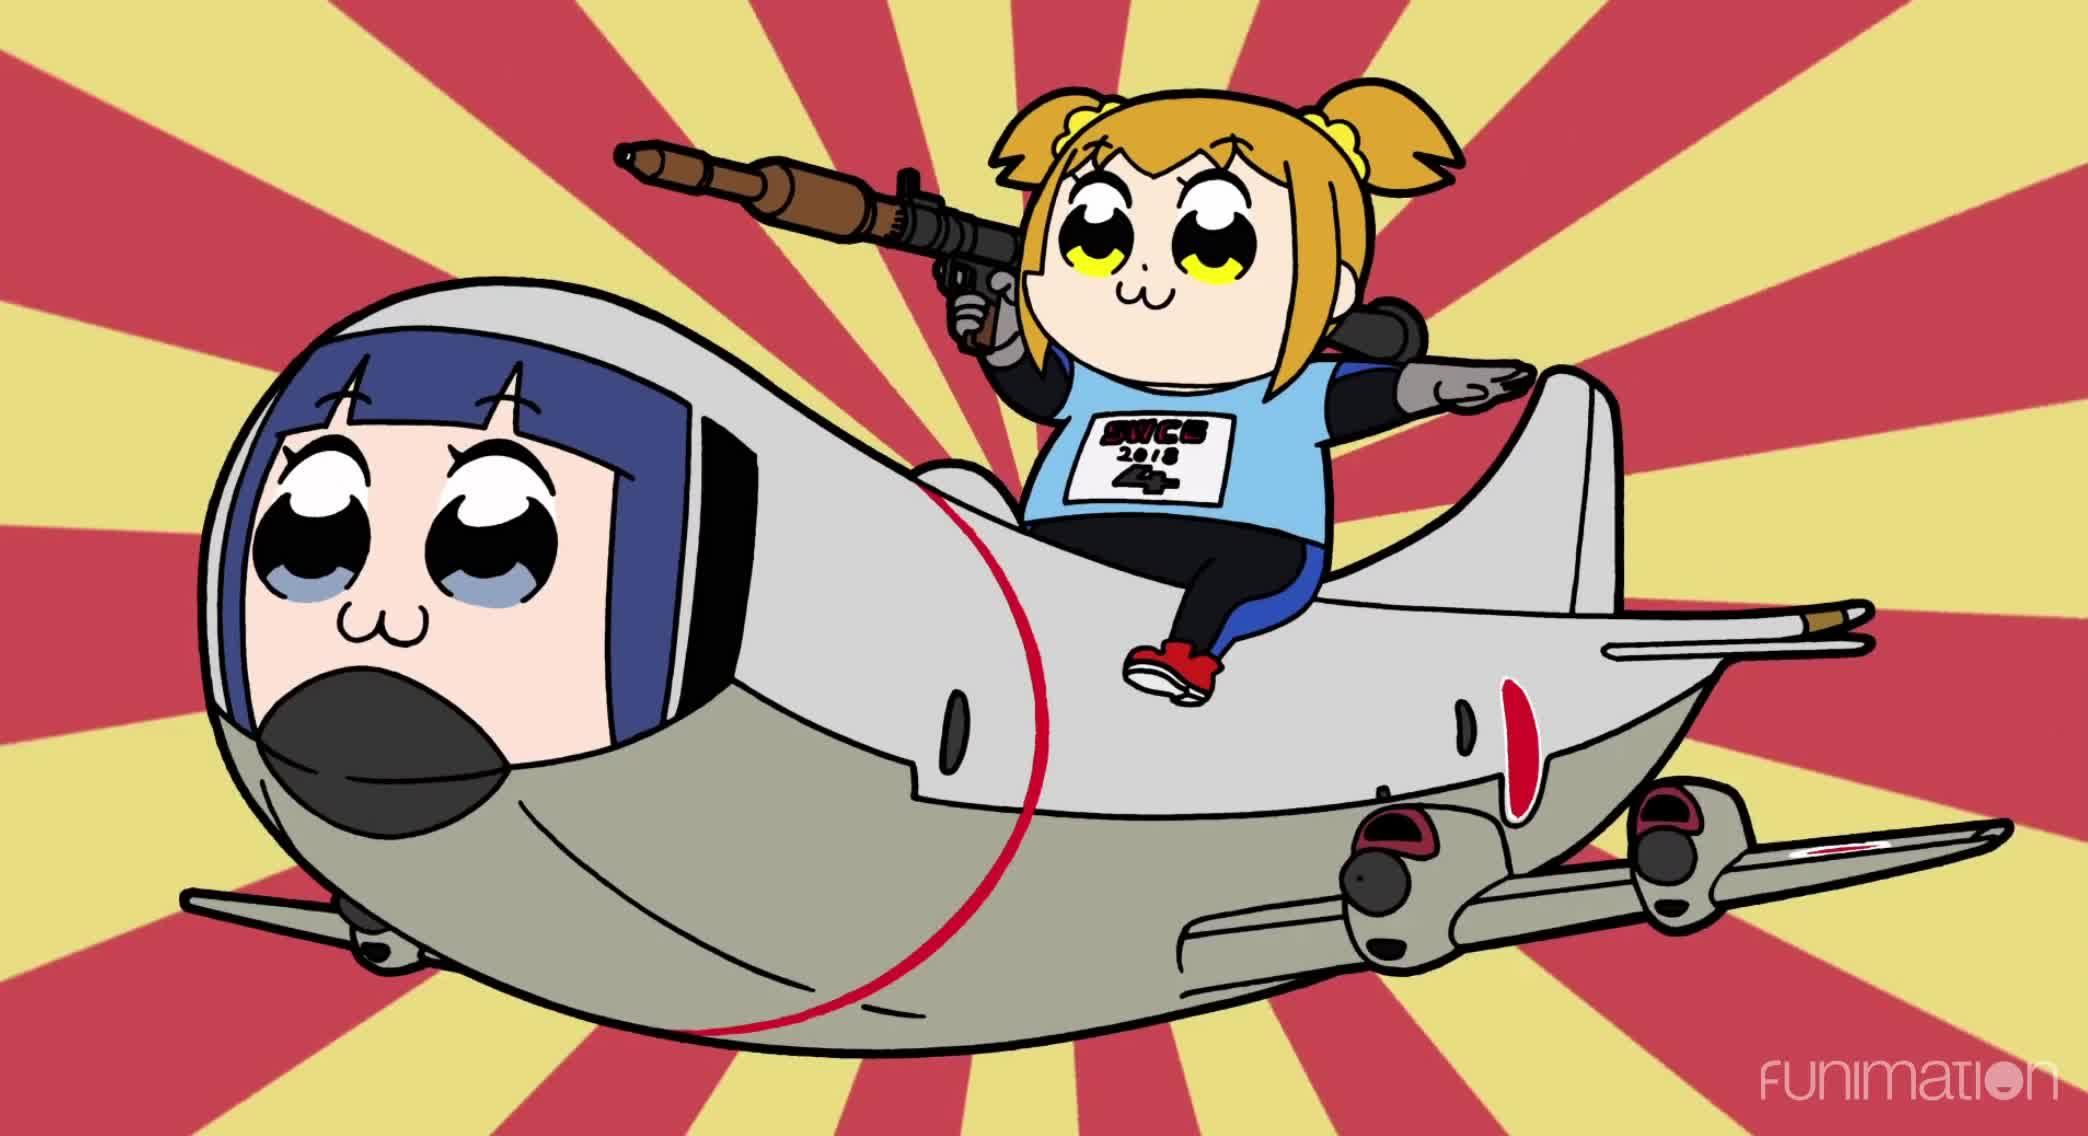 anime, cartoon, comedy, funimation, funny, pop team epic, pop team epic episode 5, New Mode GIFs